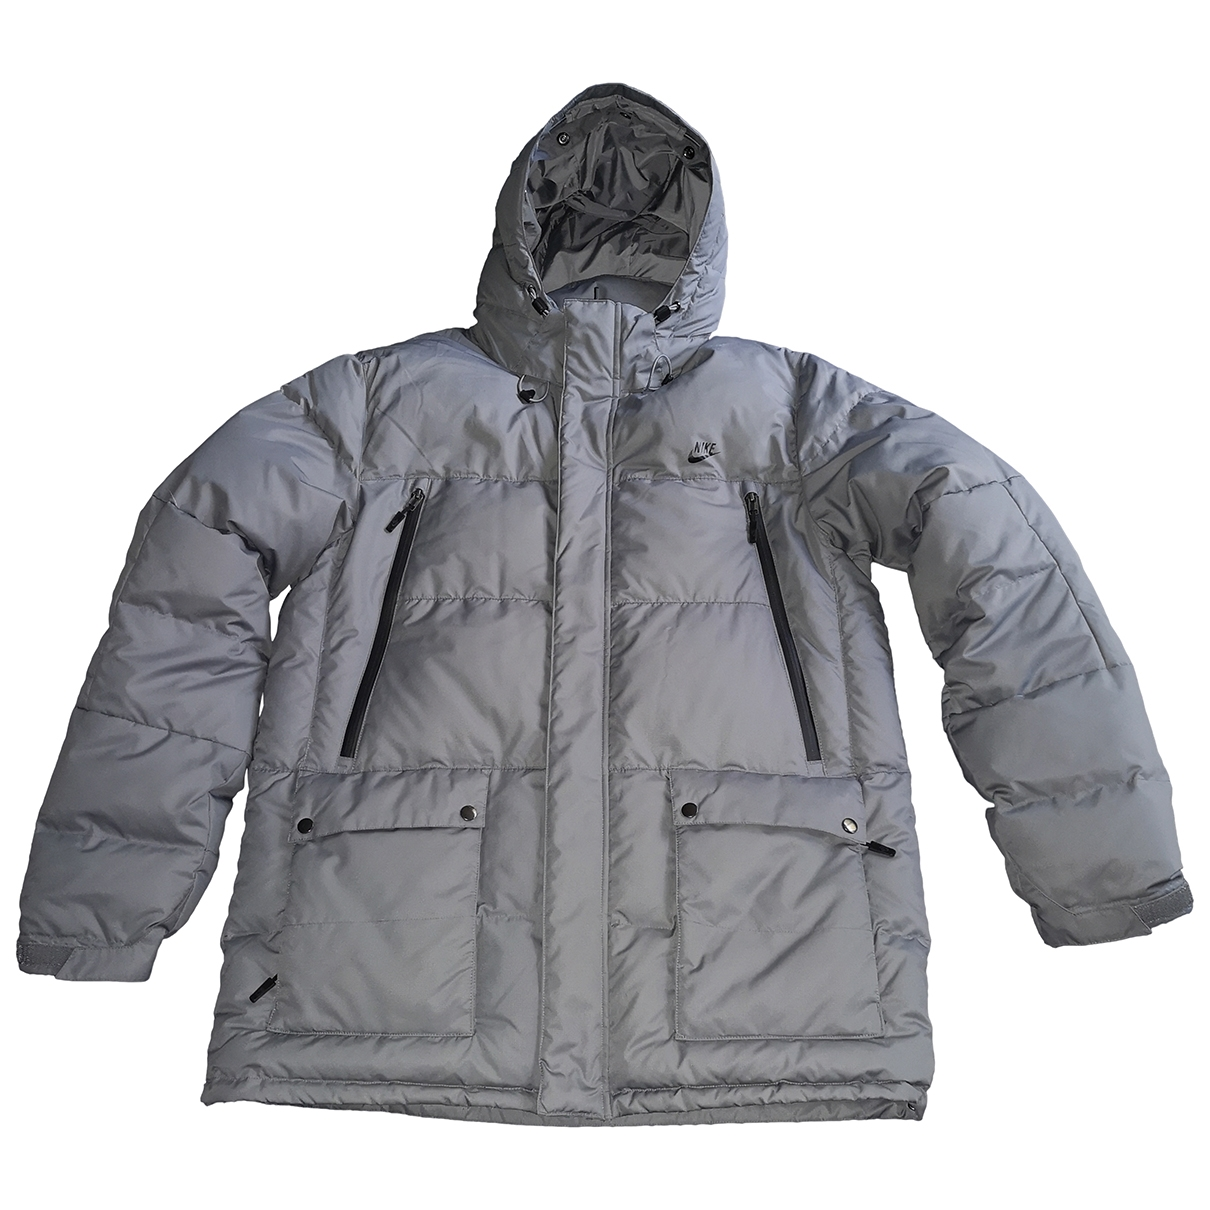 Nike \N Grey coat  for Men XL International